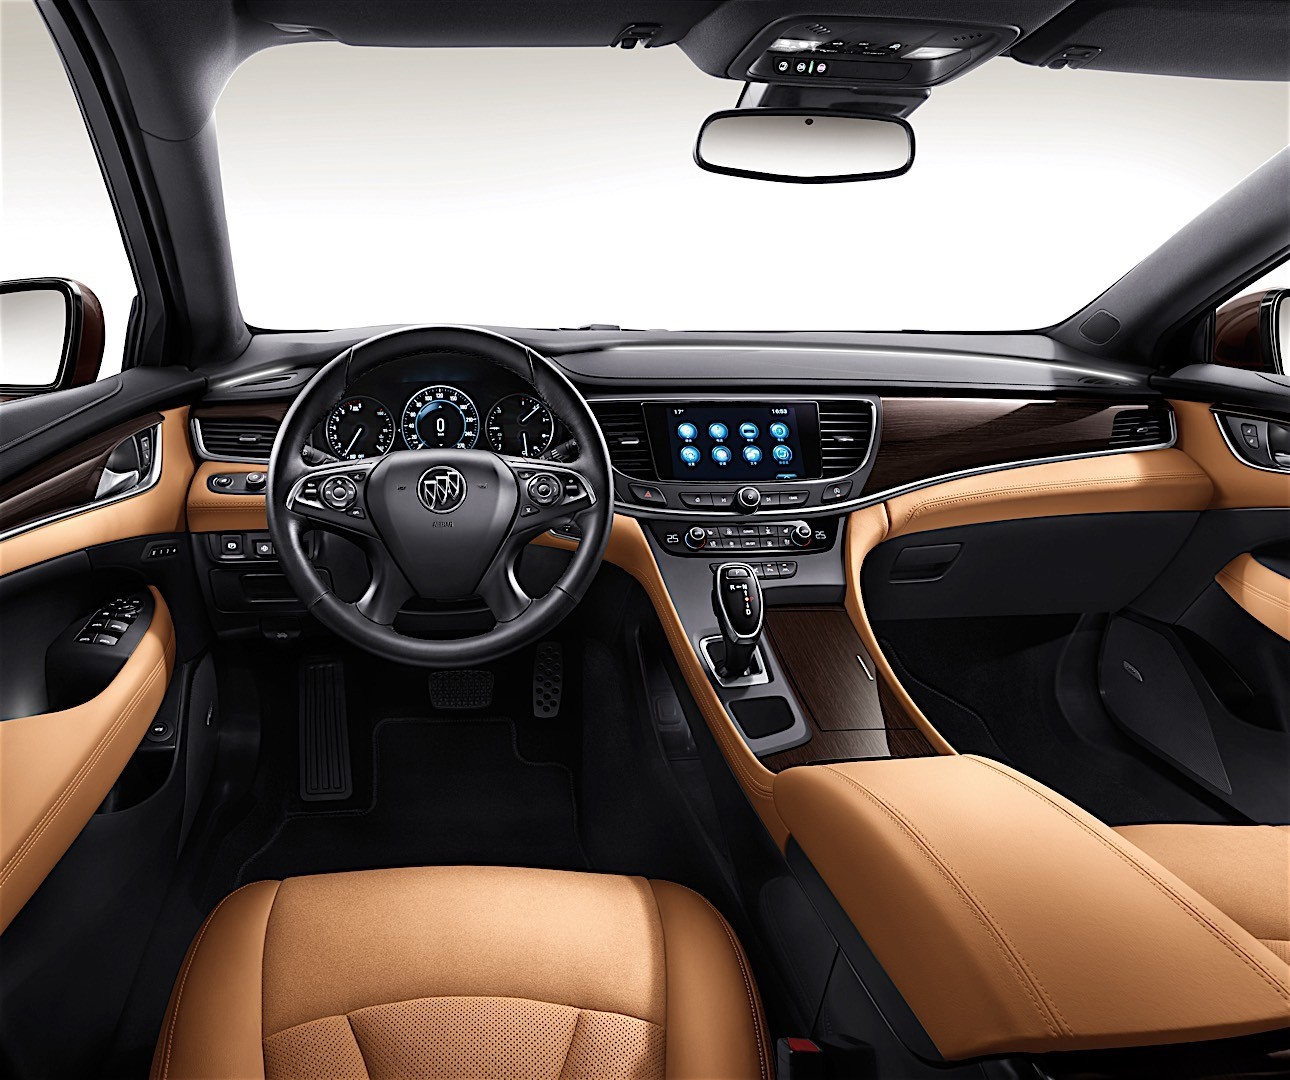 2015 Buick Lacrosse Redesign: BUICK LaCrosse Specs